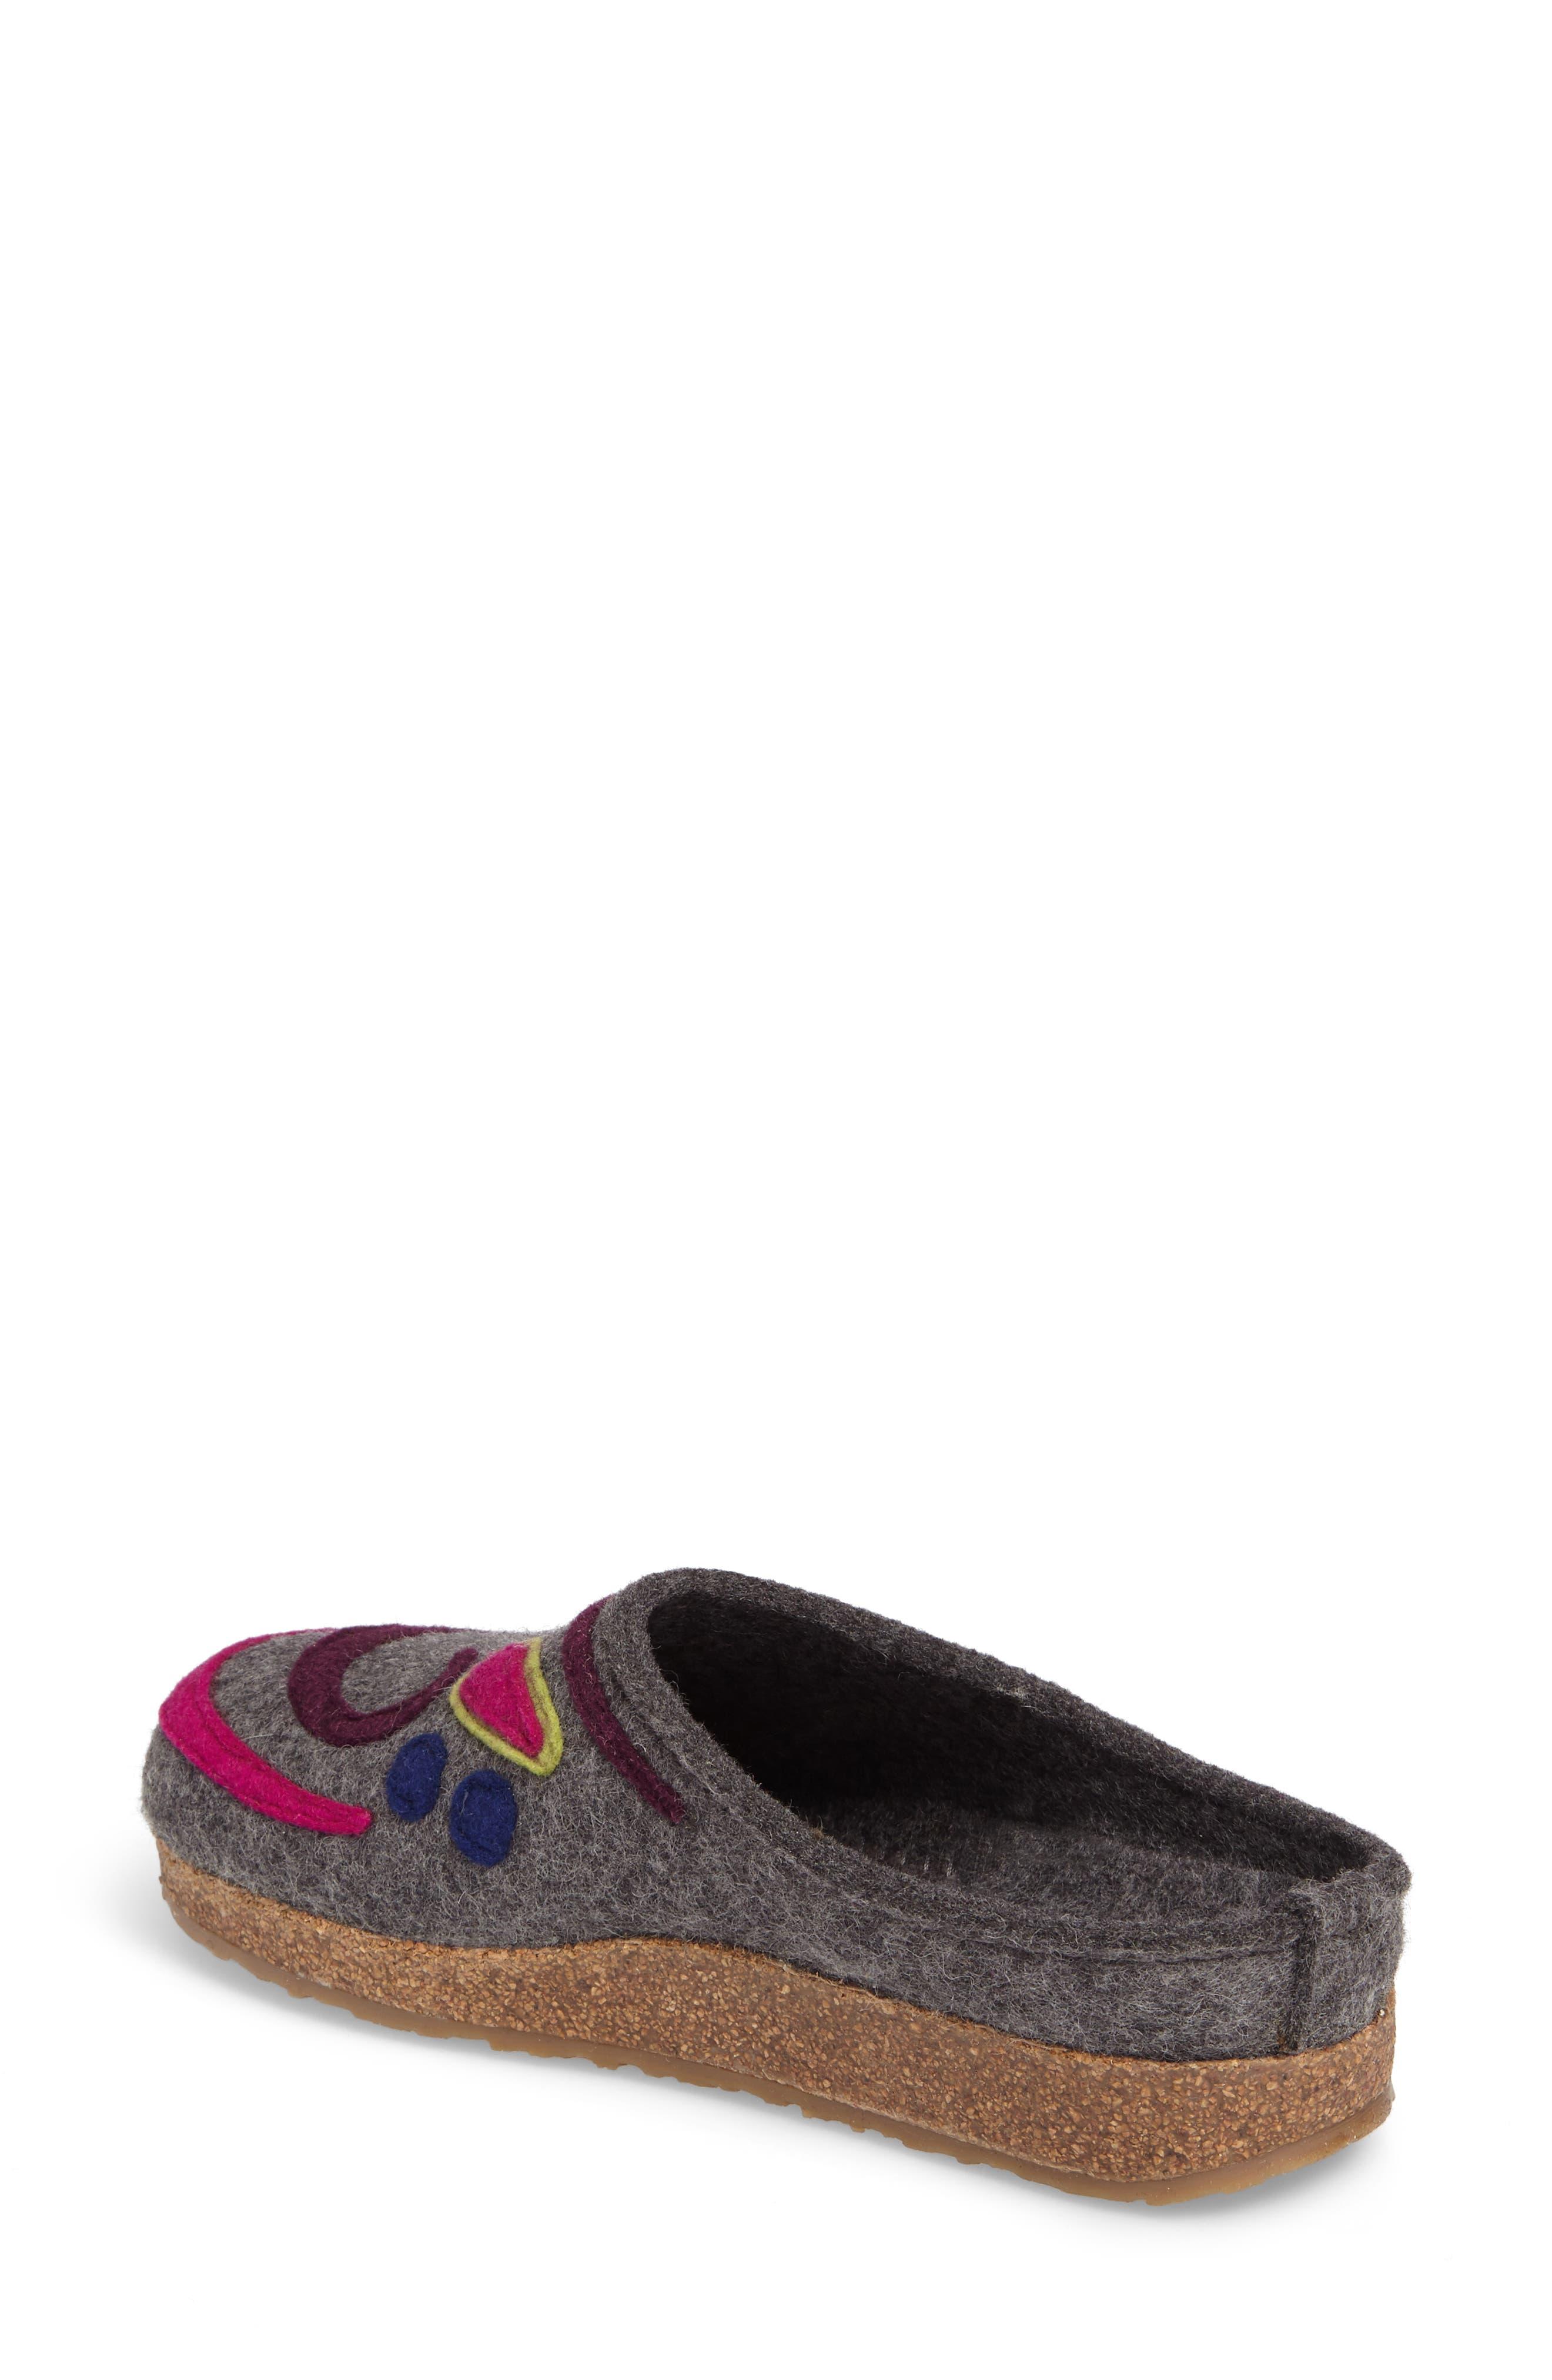 Harmony Slipper,                             Alternate thumbnail 2, color,                             Grey Wool